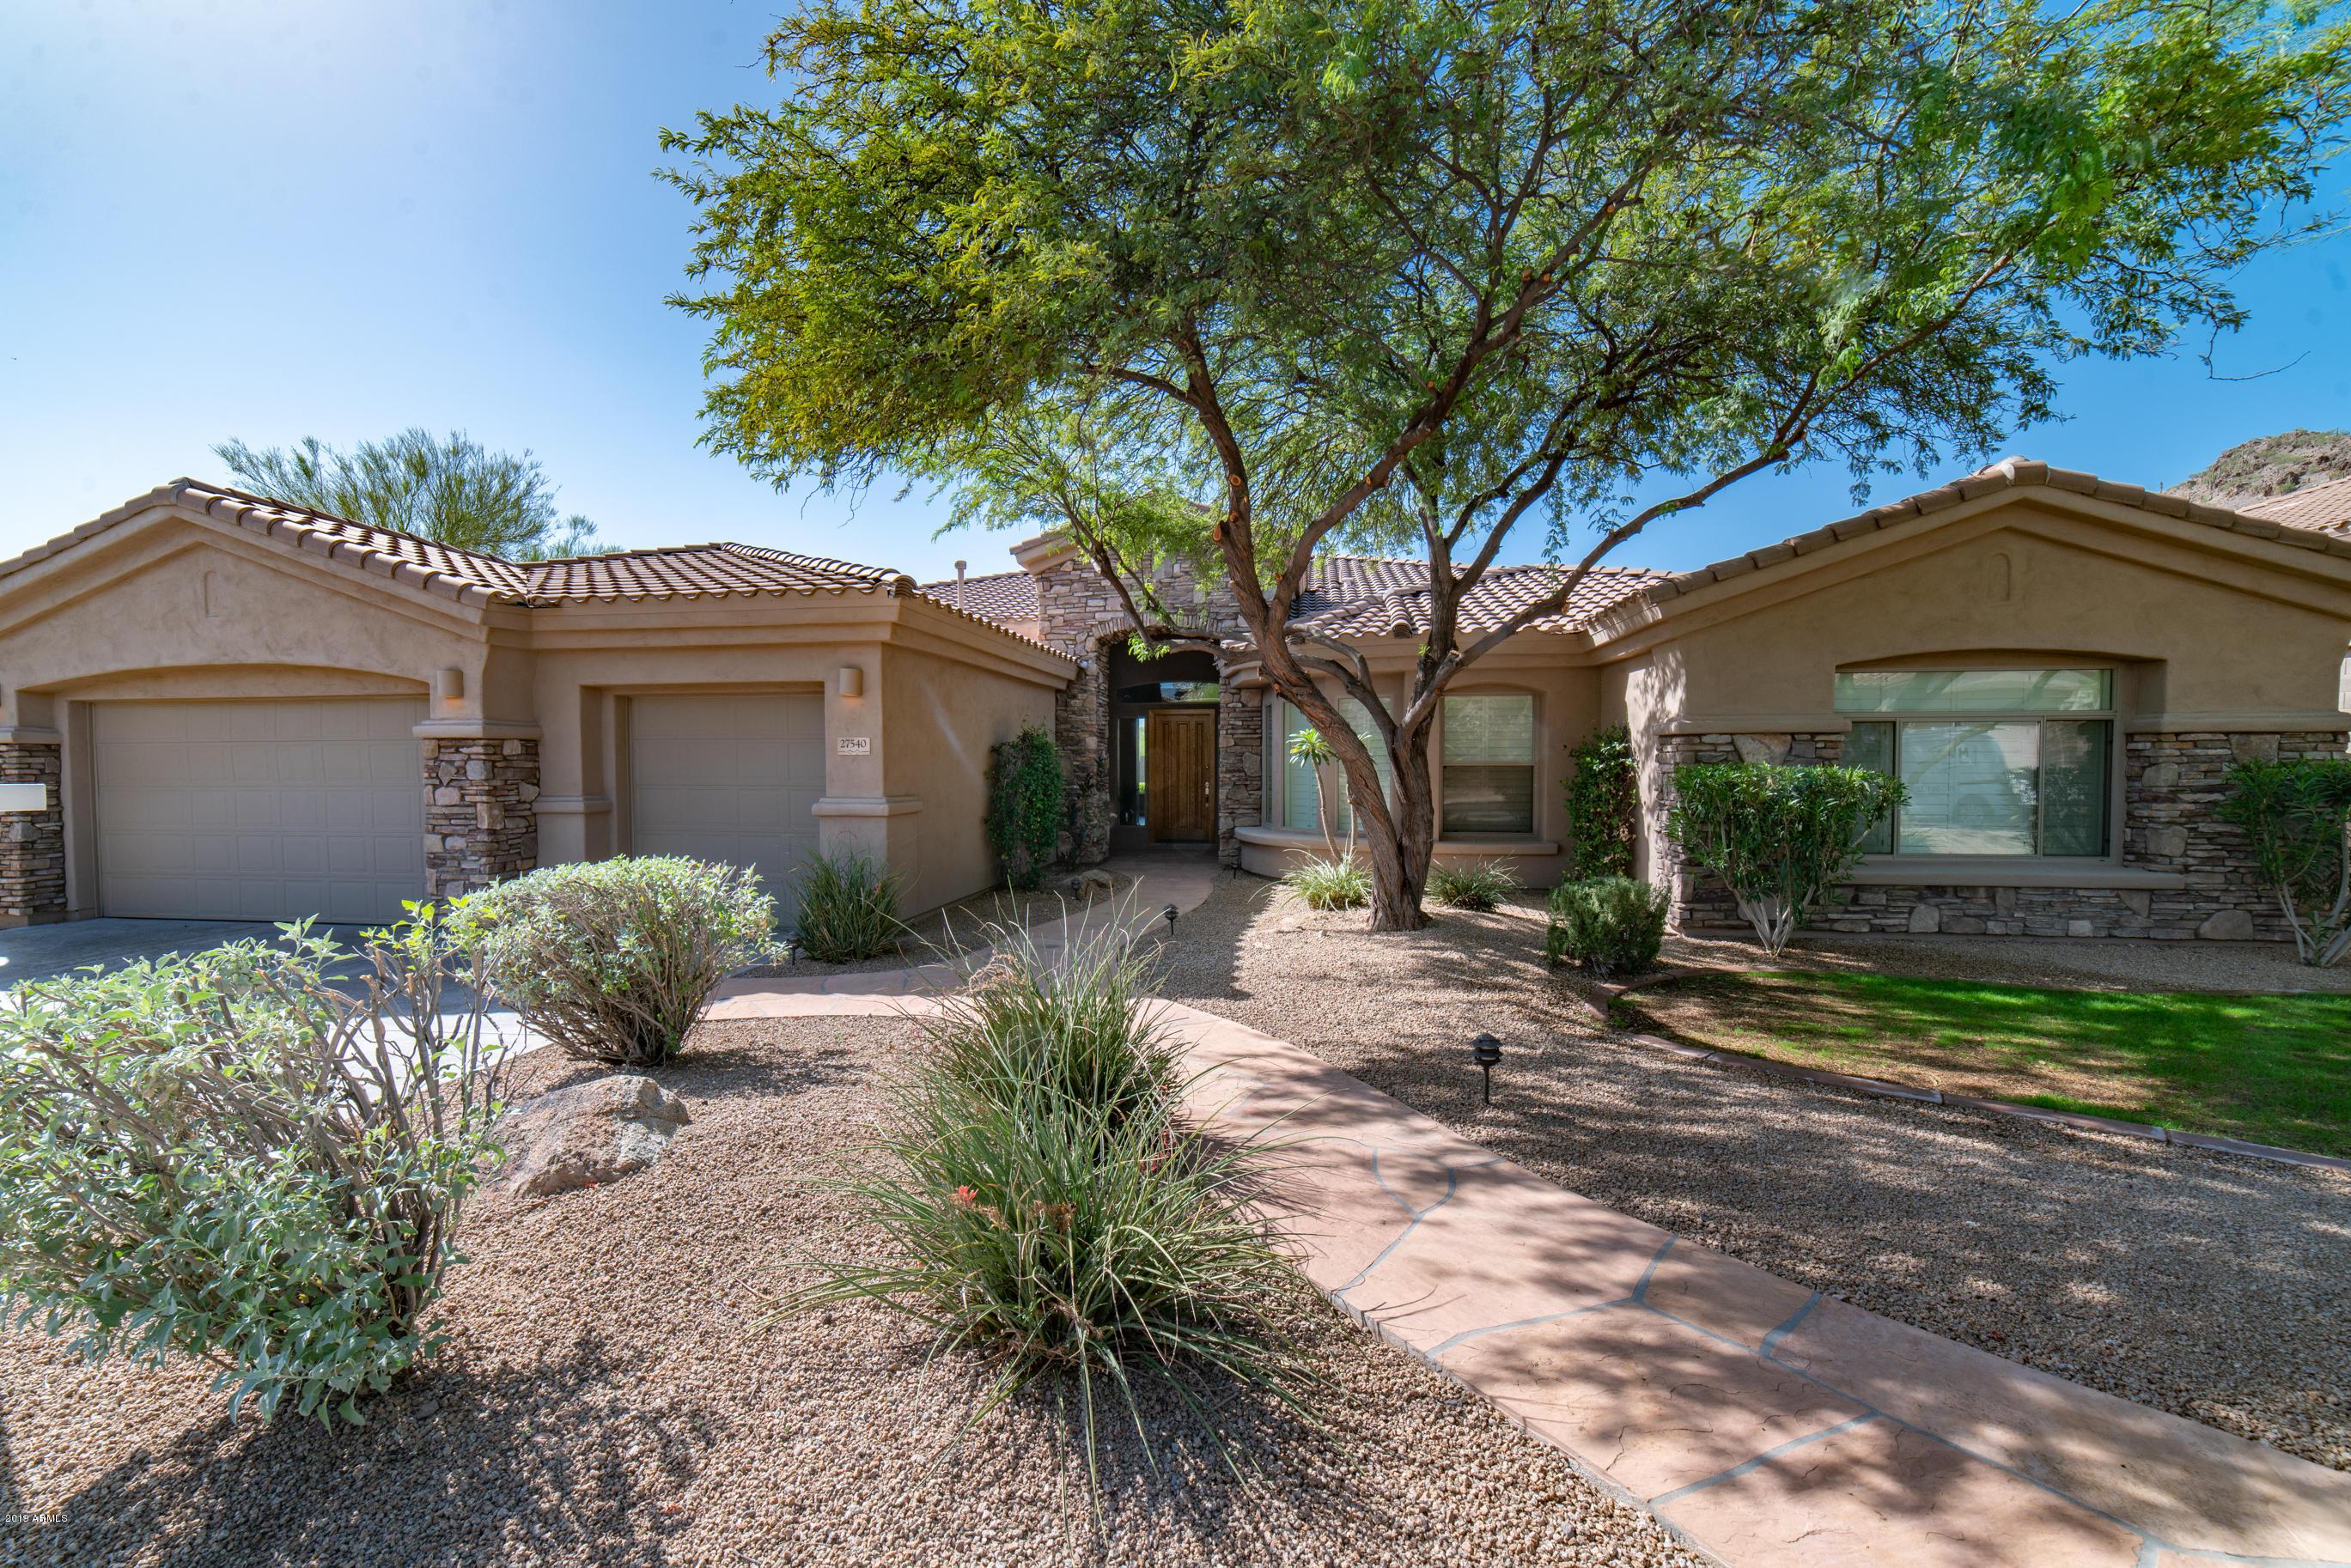 MLS 6122121 Peoria Metro Area, Peoria, AZ 85383 Peoria Homes for Rent